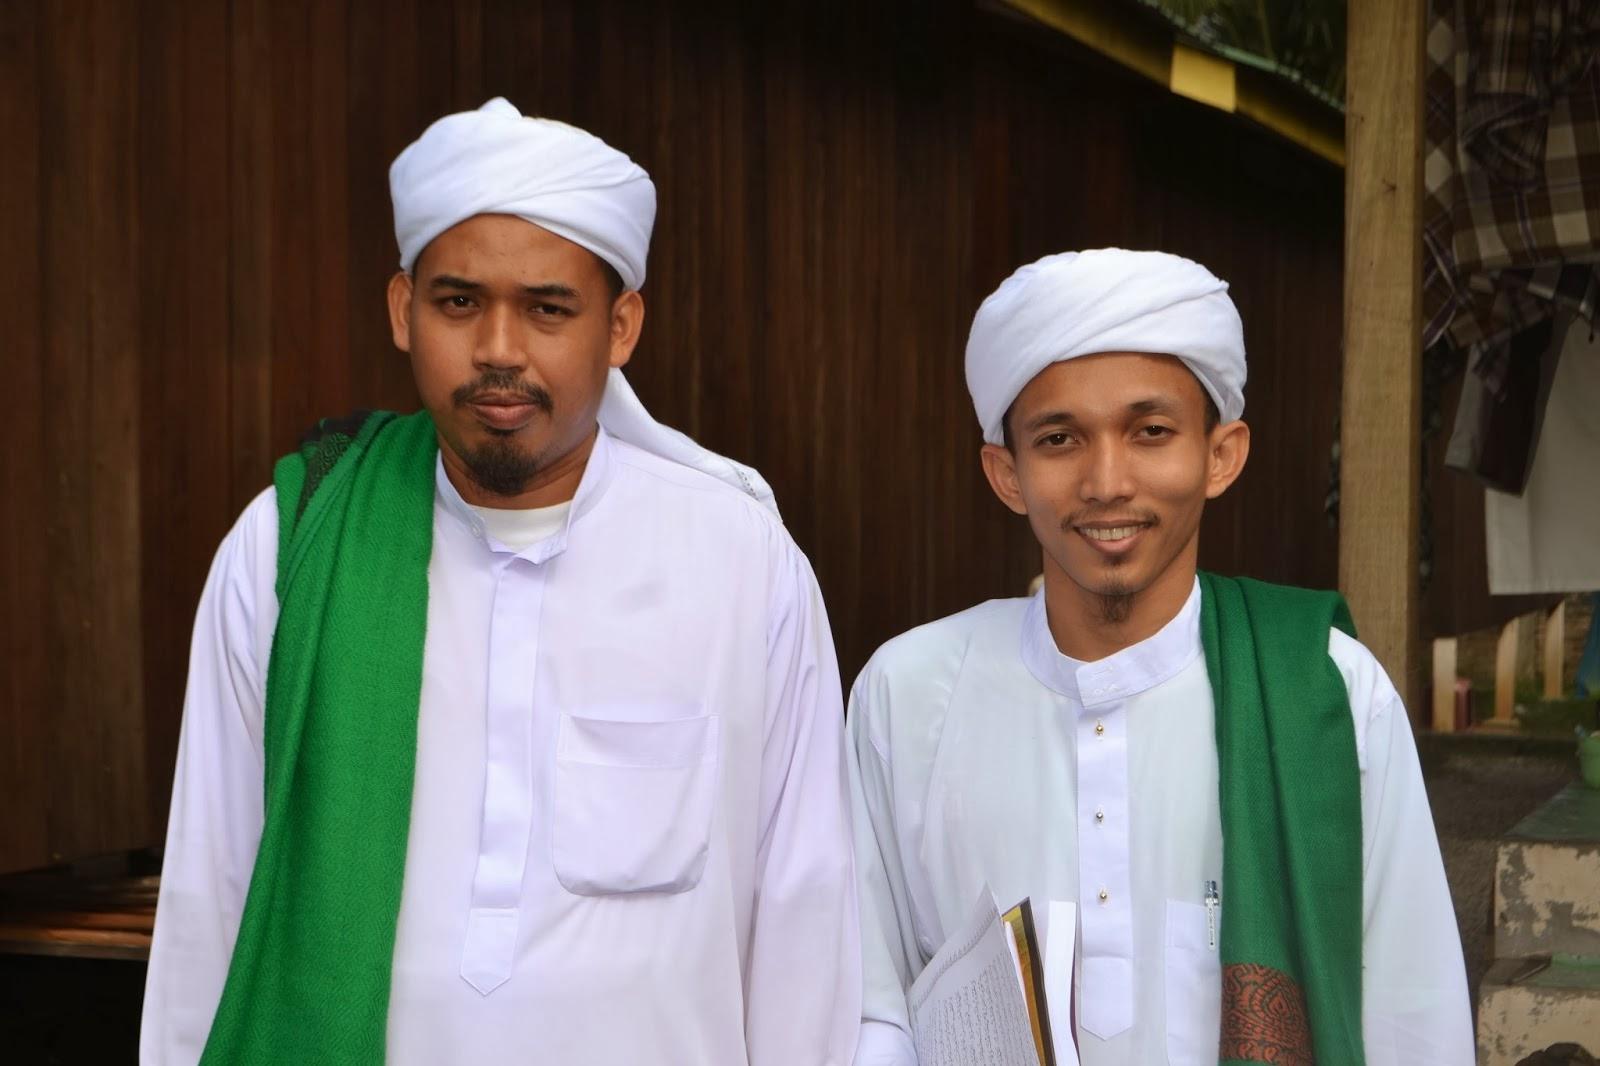 Ustaz Yazid Bin Tuan Guru Haji Salleh